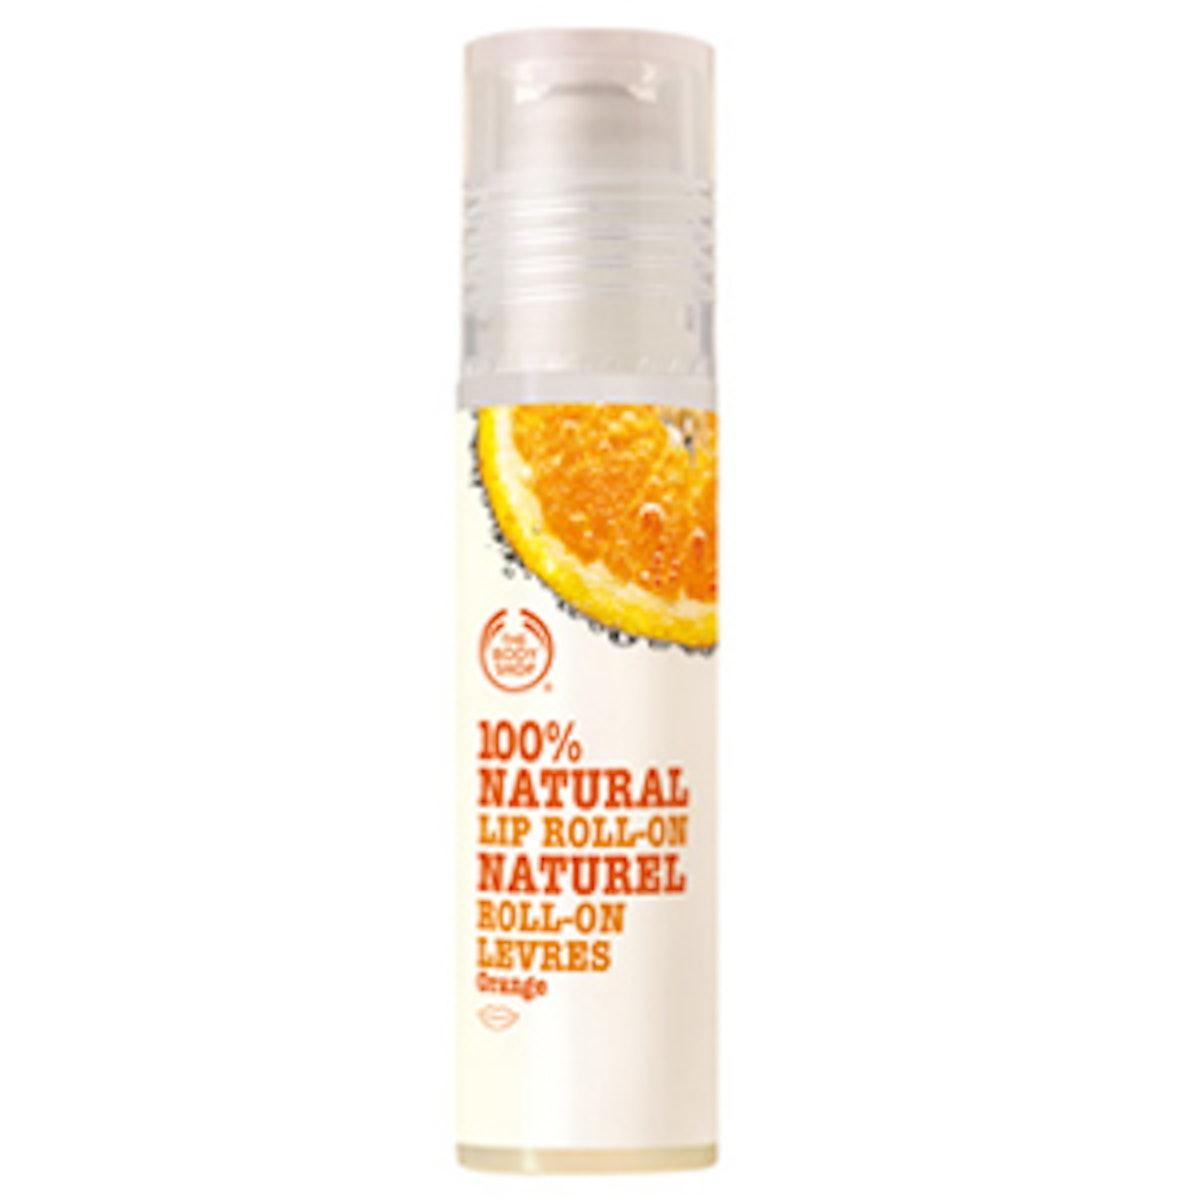 Natural Lip Roll On Orange